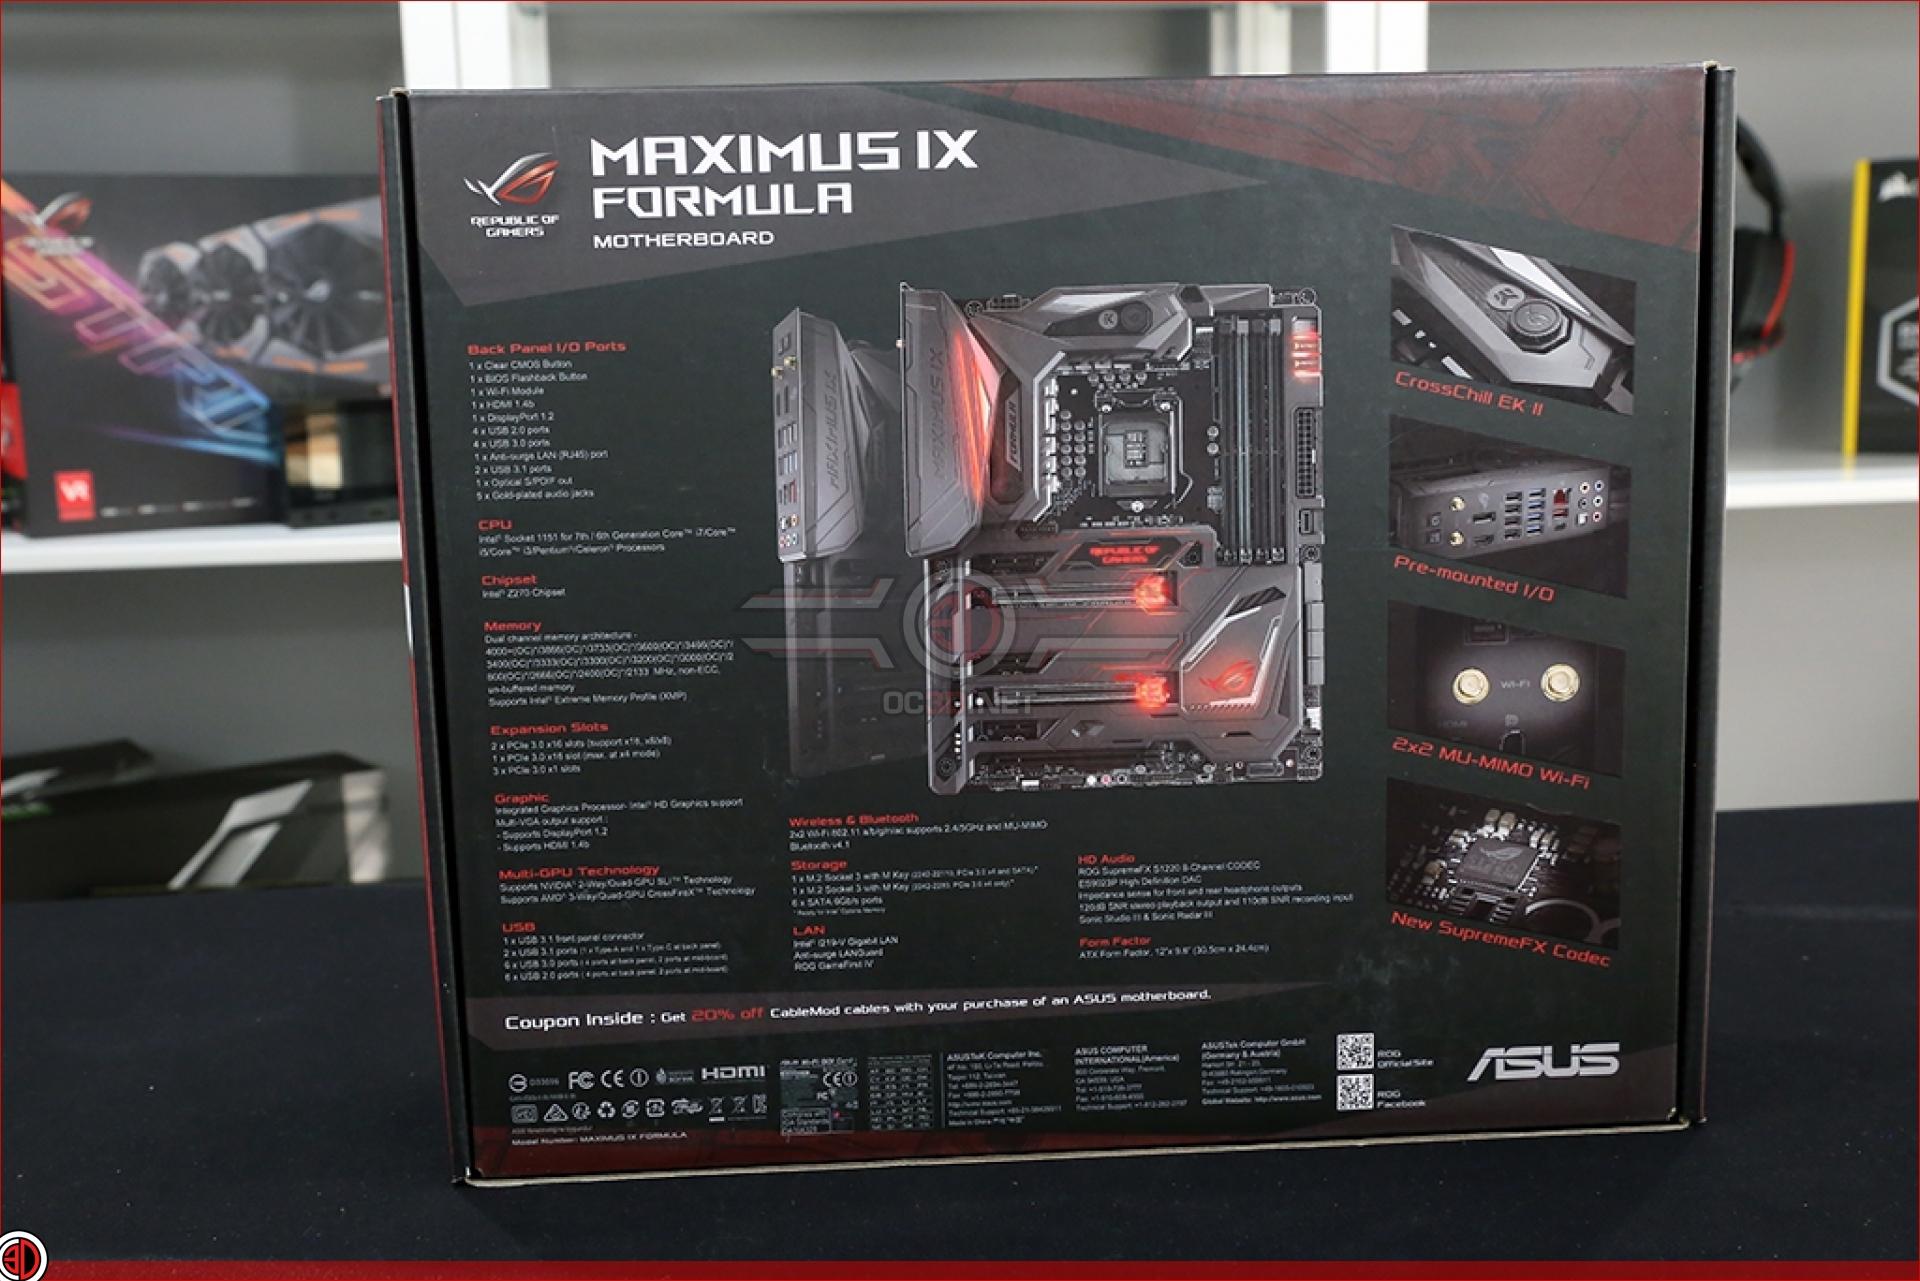 ASUS ROG Z270 Maximus IX Code and Formula Review & Comparison | Maximus IX Formula | CPU ...